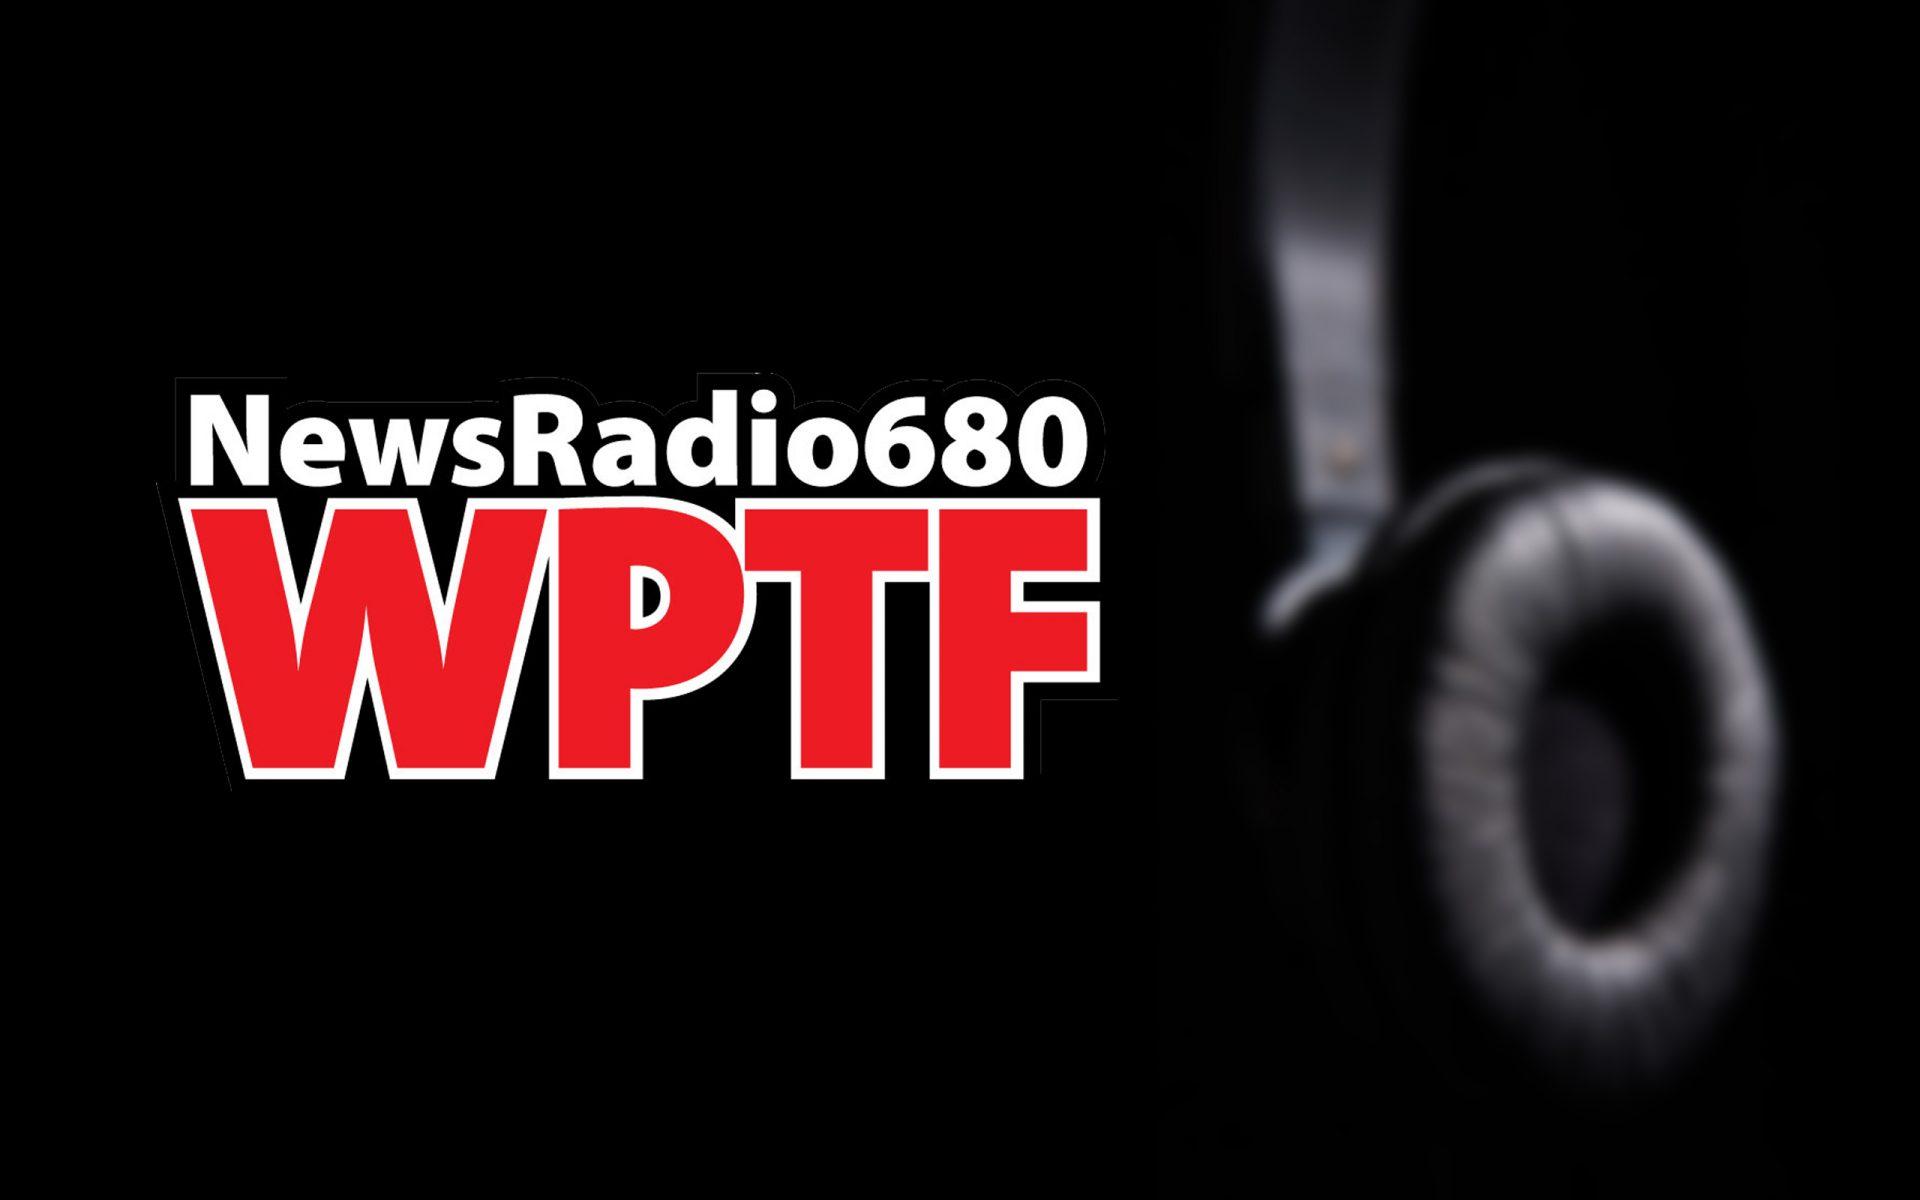 WPTF AM Radio